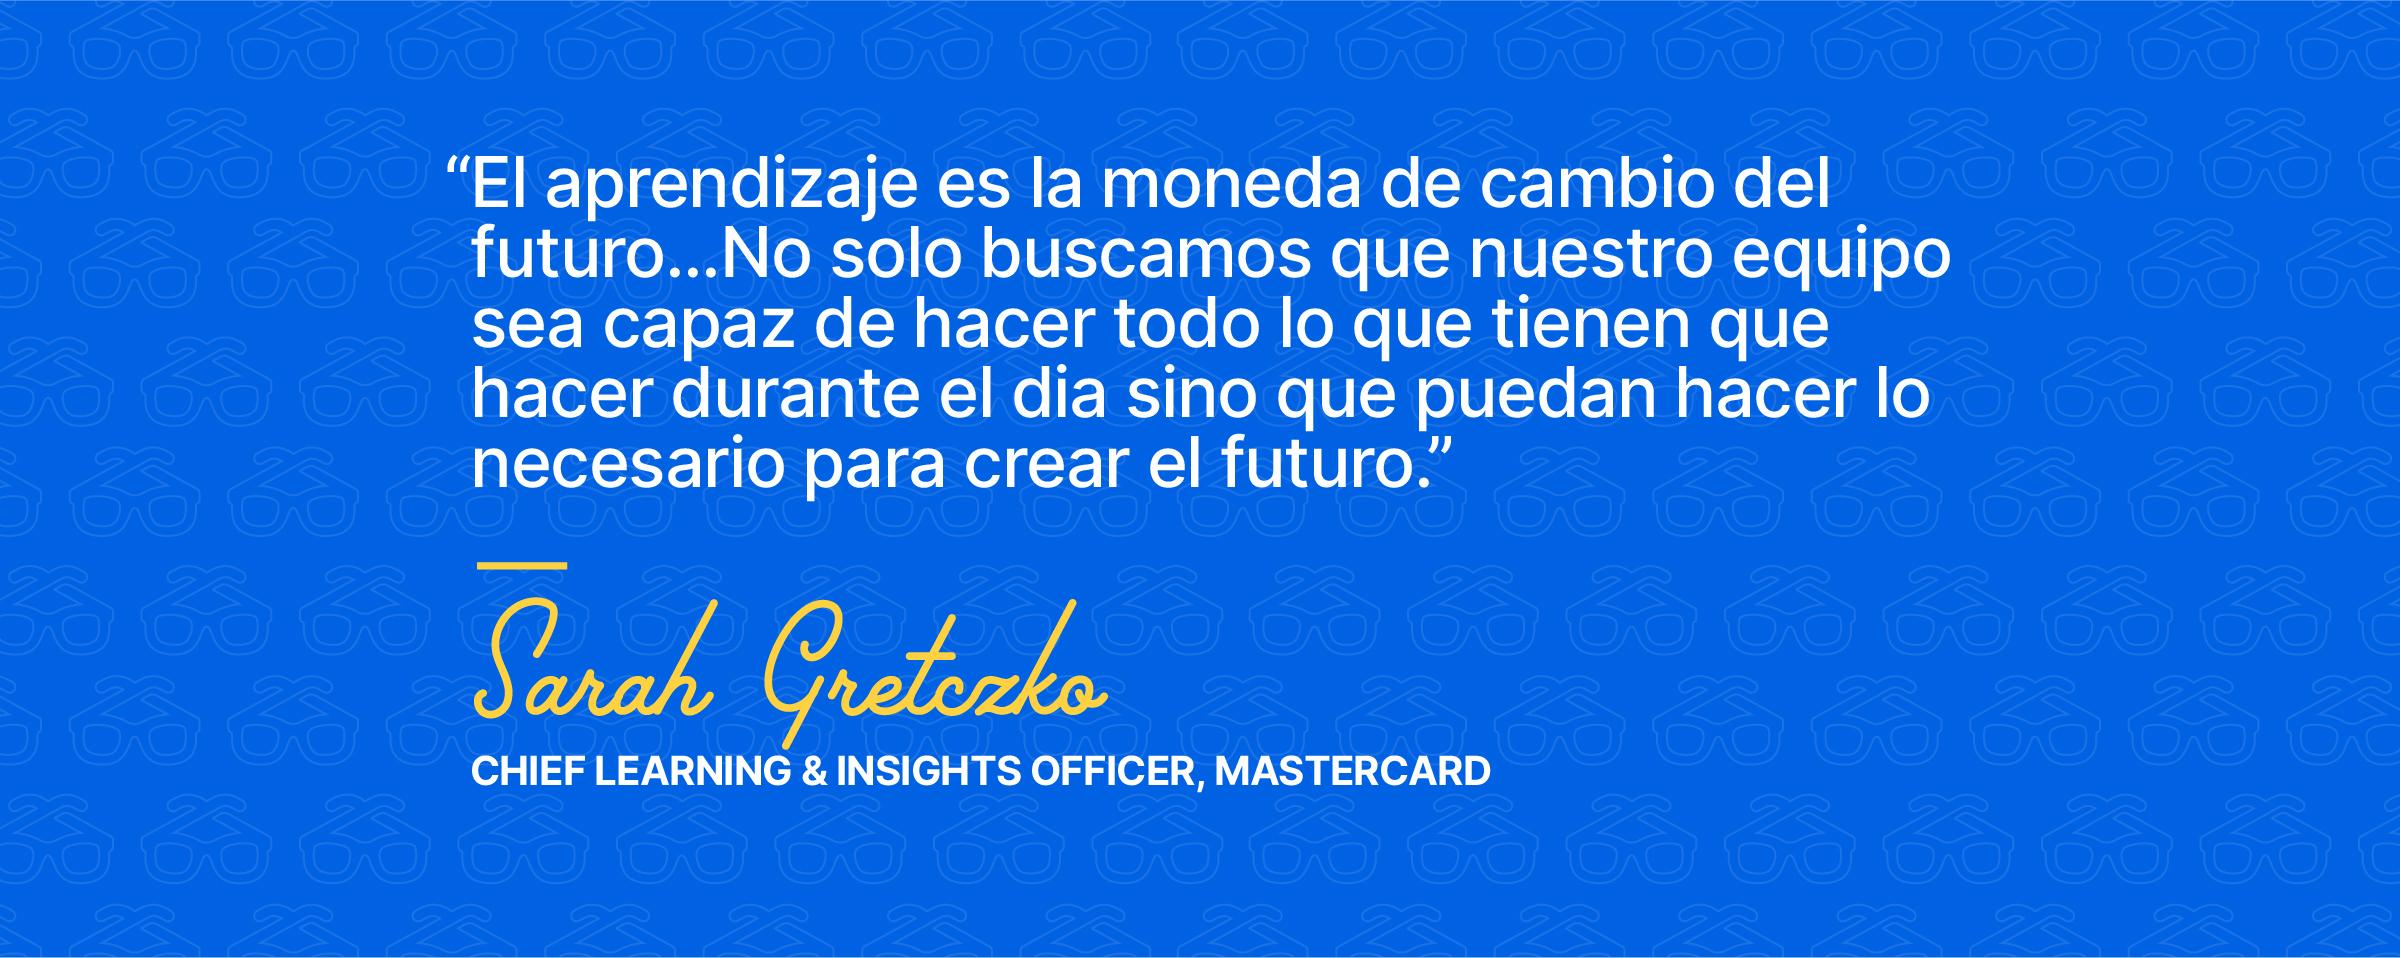 2020_LENS_Lite_Hubspot_Mastercard_ImageQuote_Spanish@1x-1